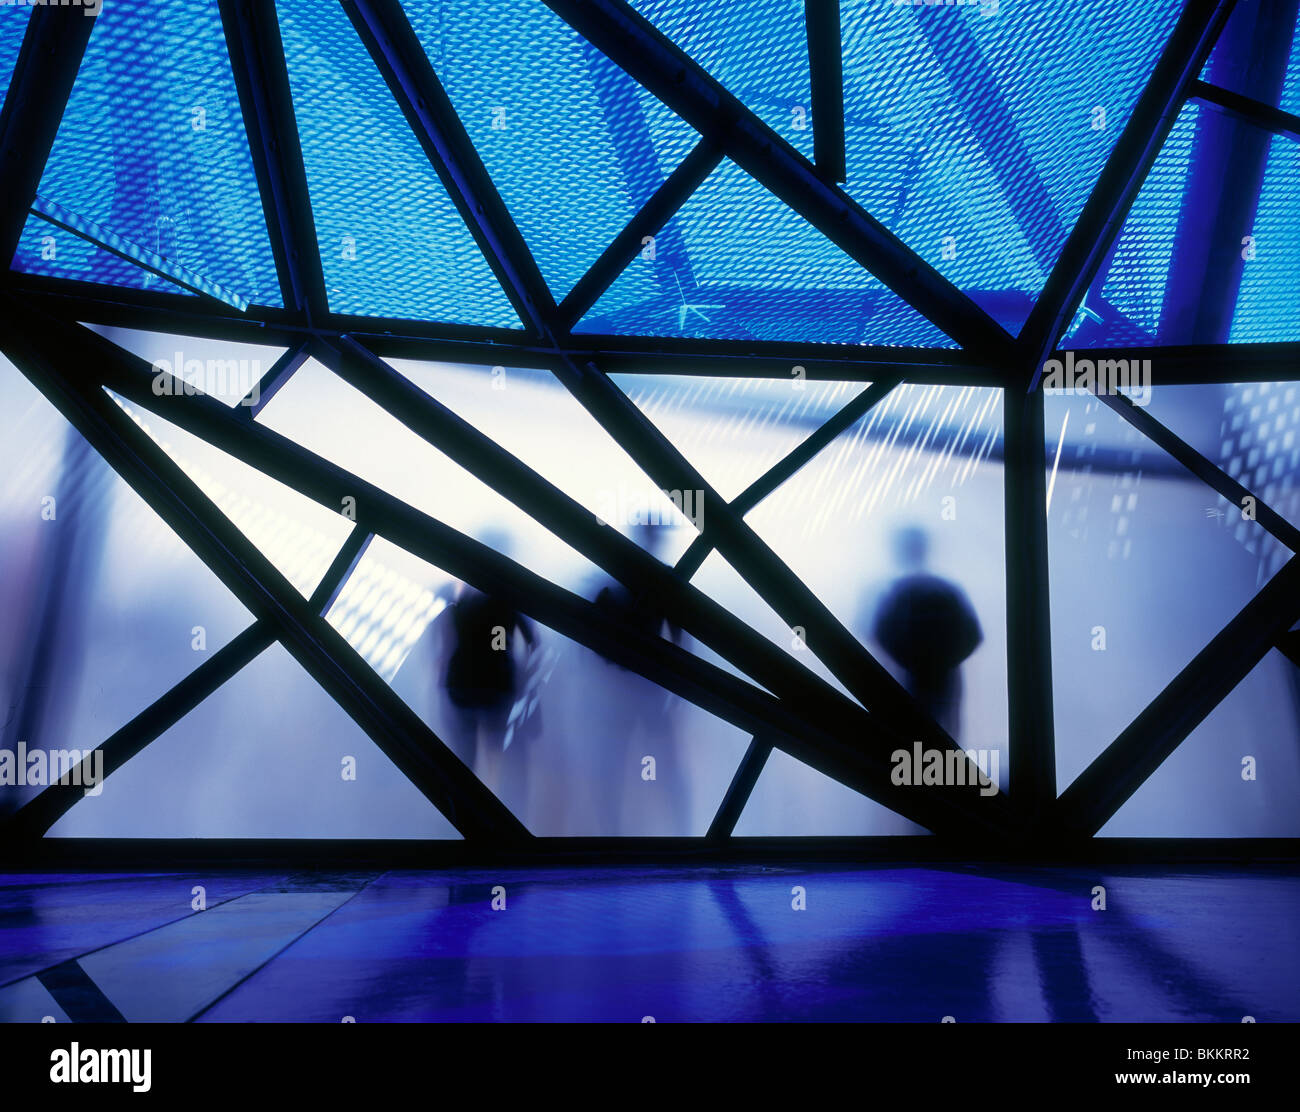 Silhouettes de personnes en face de futuristically conçu pavillon au Zaragoza, Espagne. Photo Stock